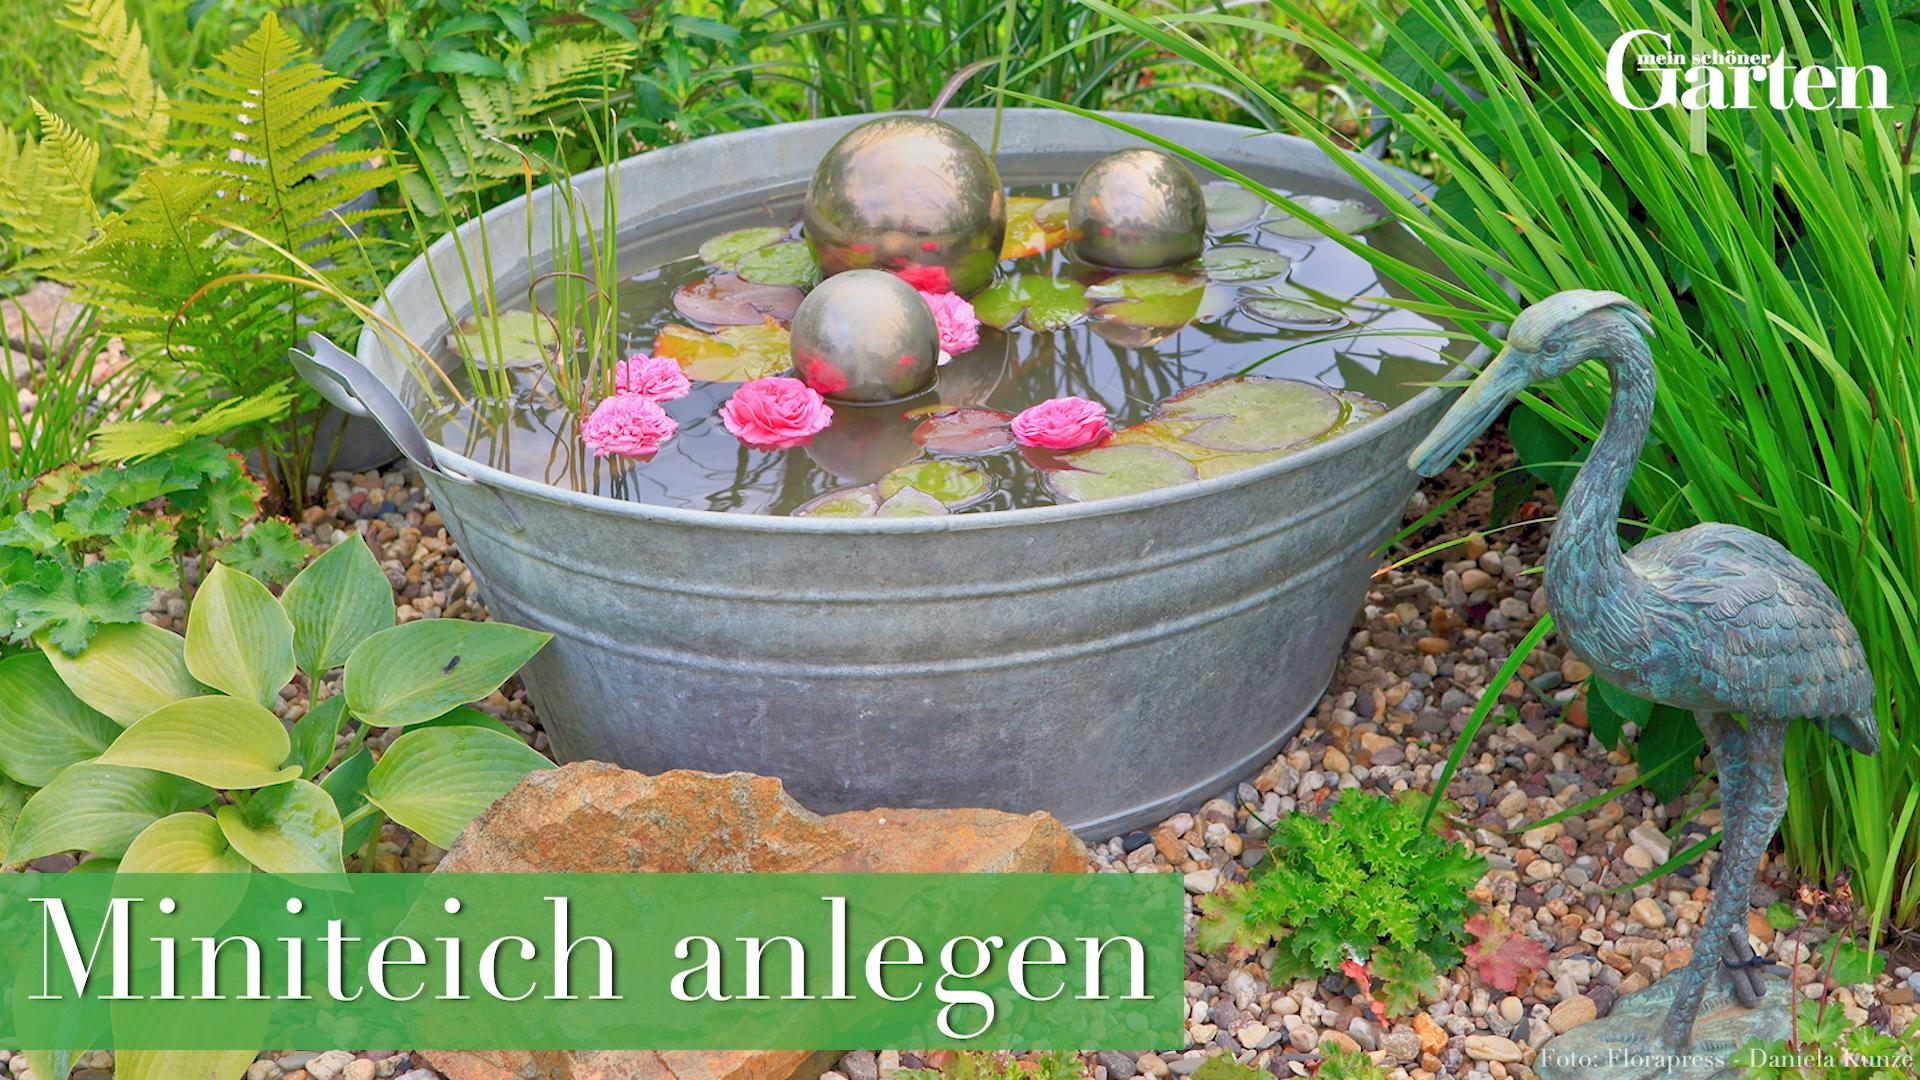 Configure the mini pond correctly